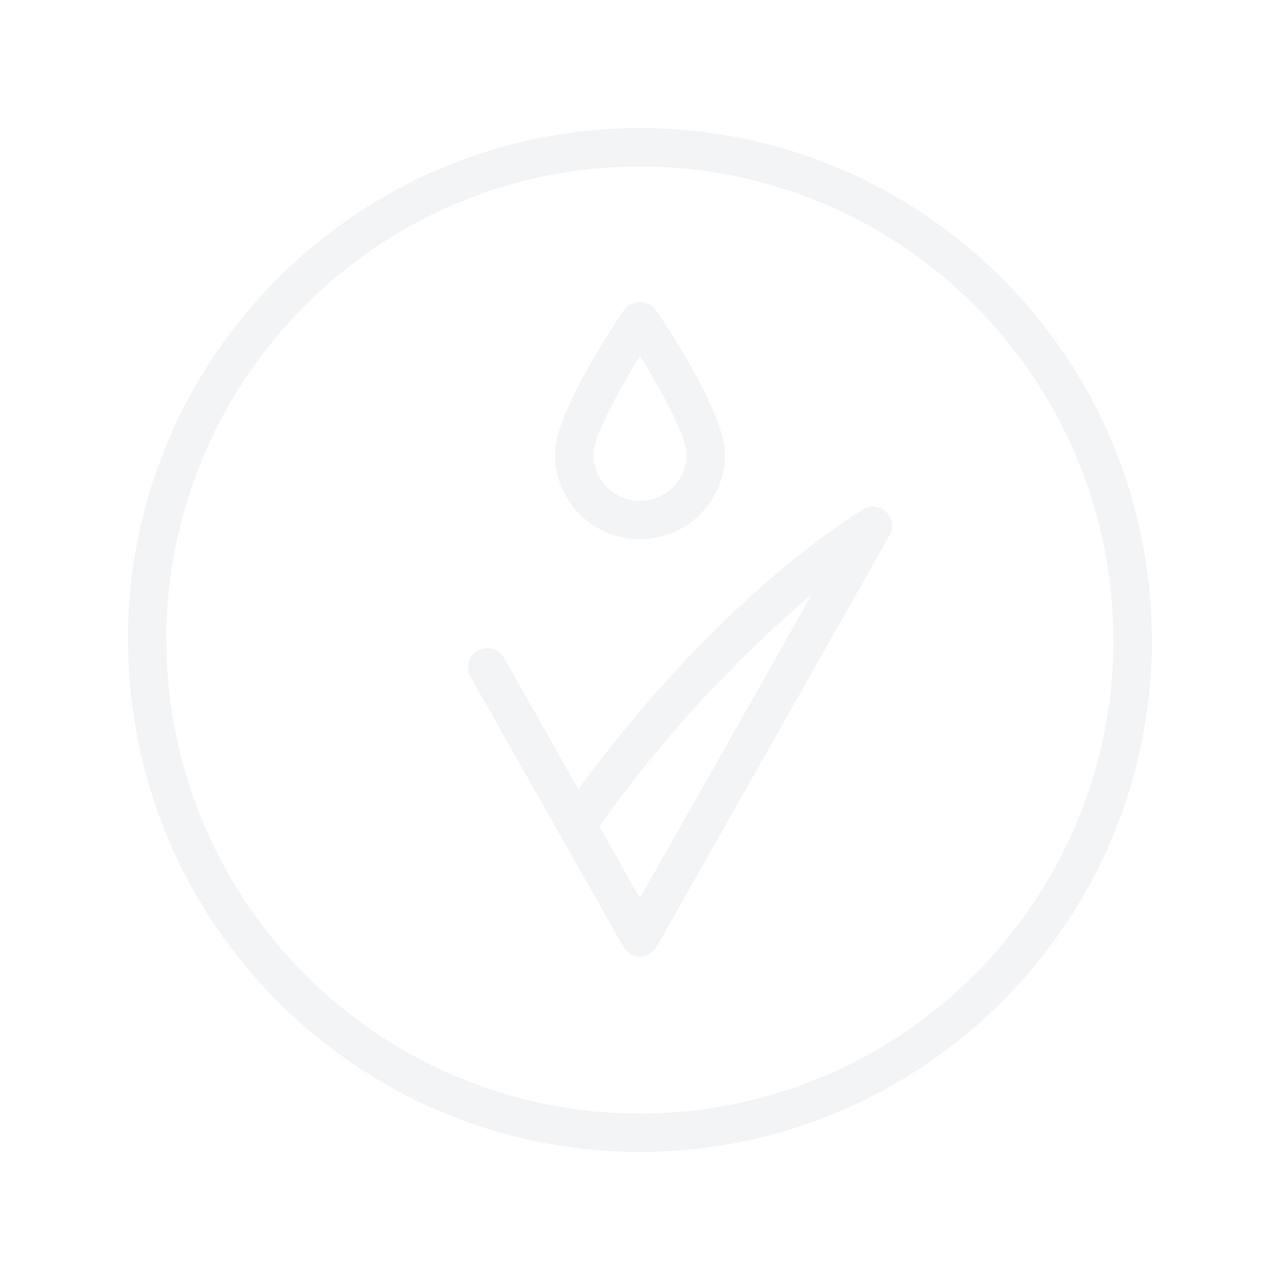 DECLEOR Hydra Floral Everfresh Light Cream 50ml